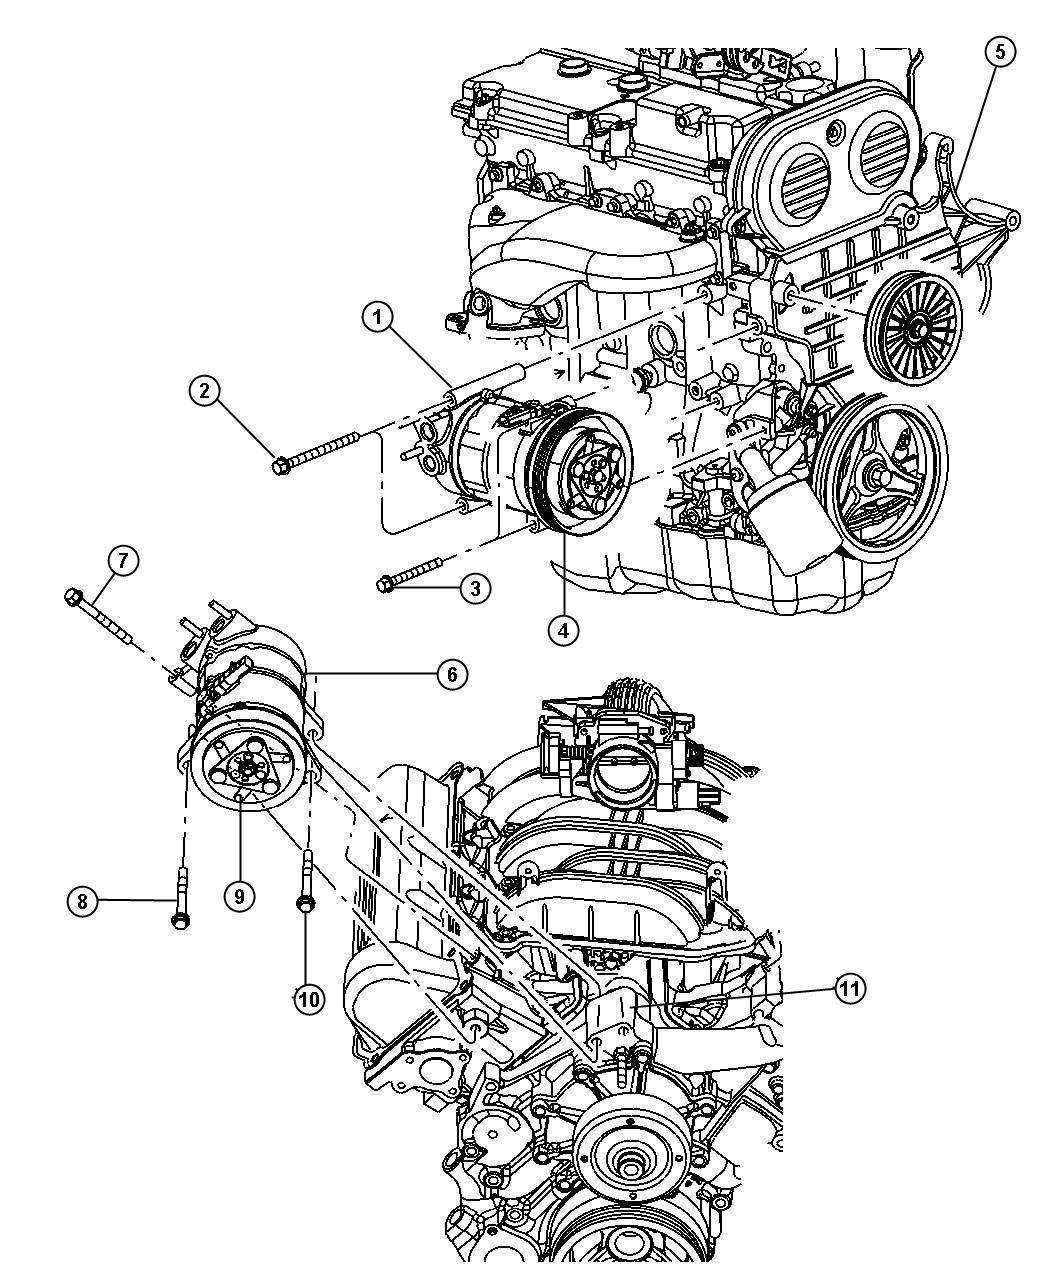 2008 Chrysler Sebring Clutch. A/c compressor. Conditioning